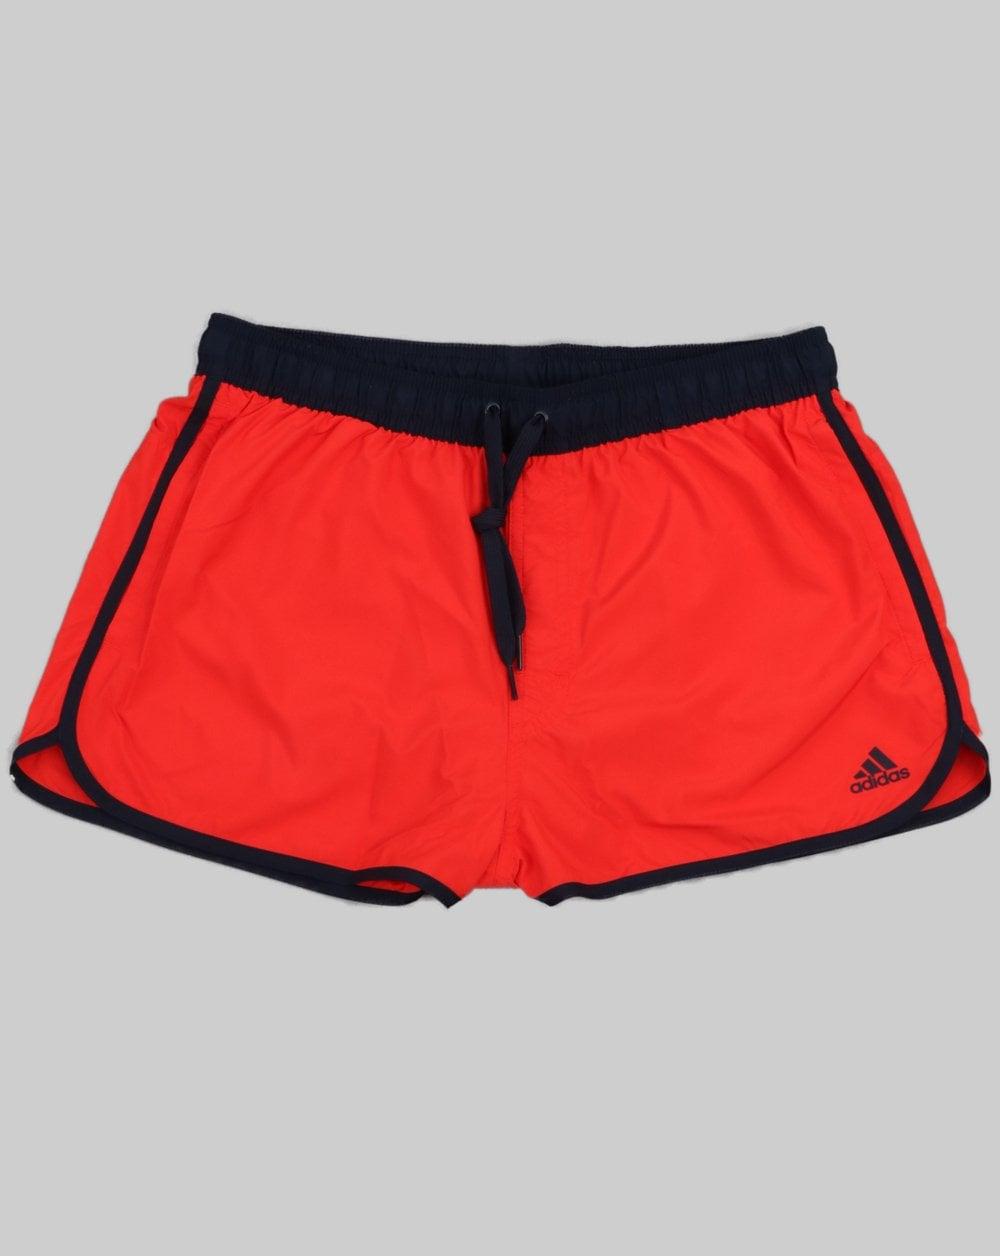 7a2d4881e7fab adidas Originals Adidas Originals Split Swim Shorts Active Red